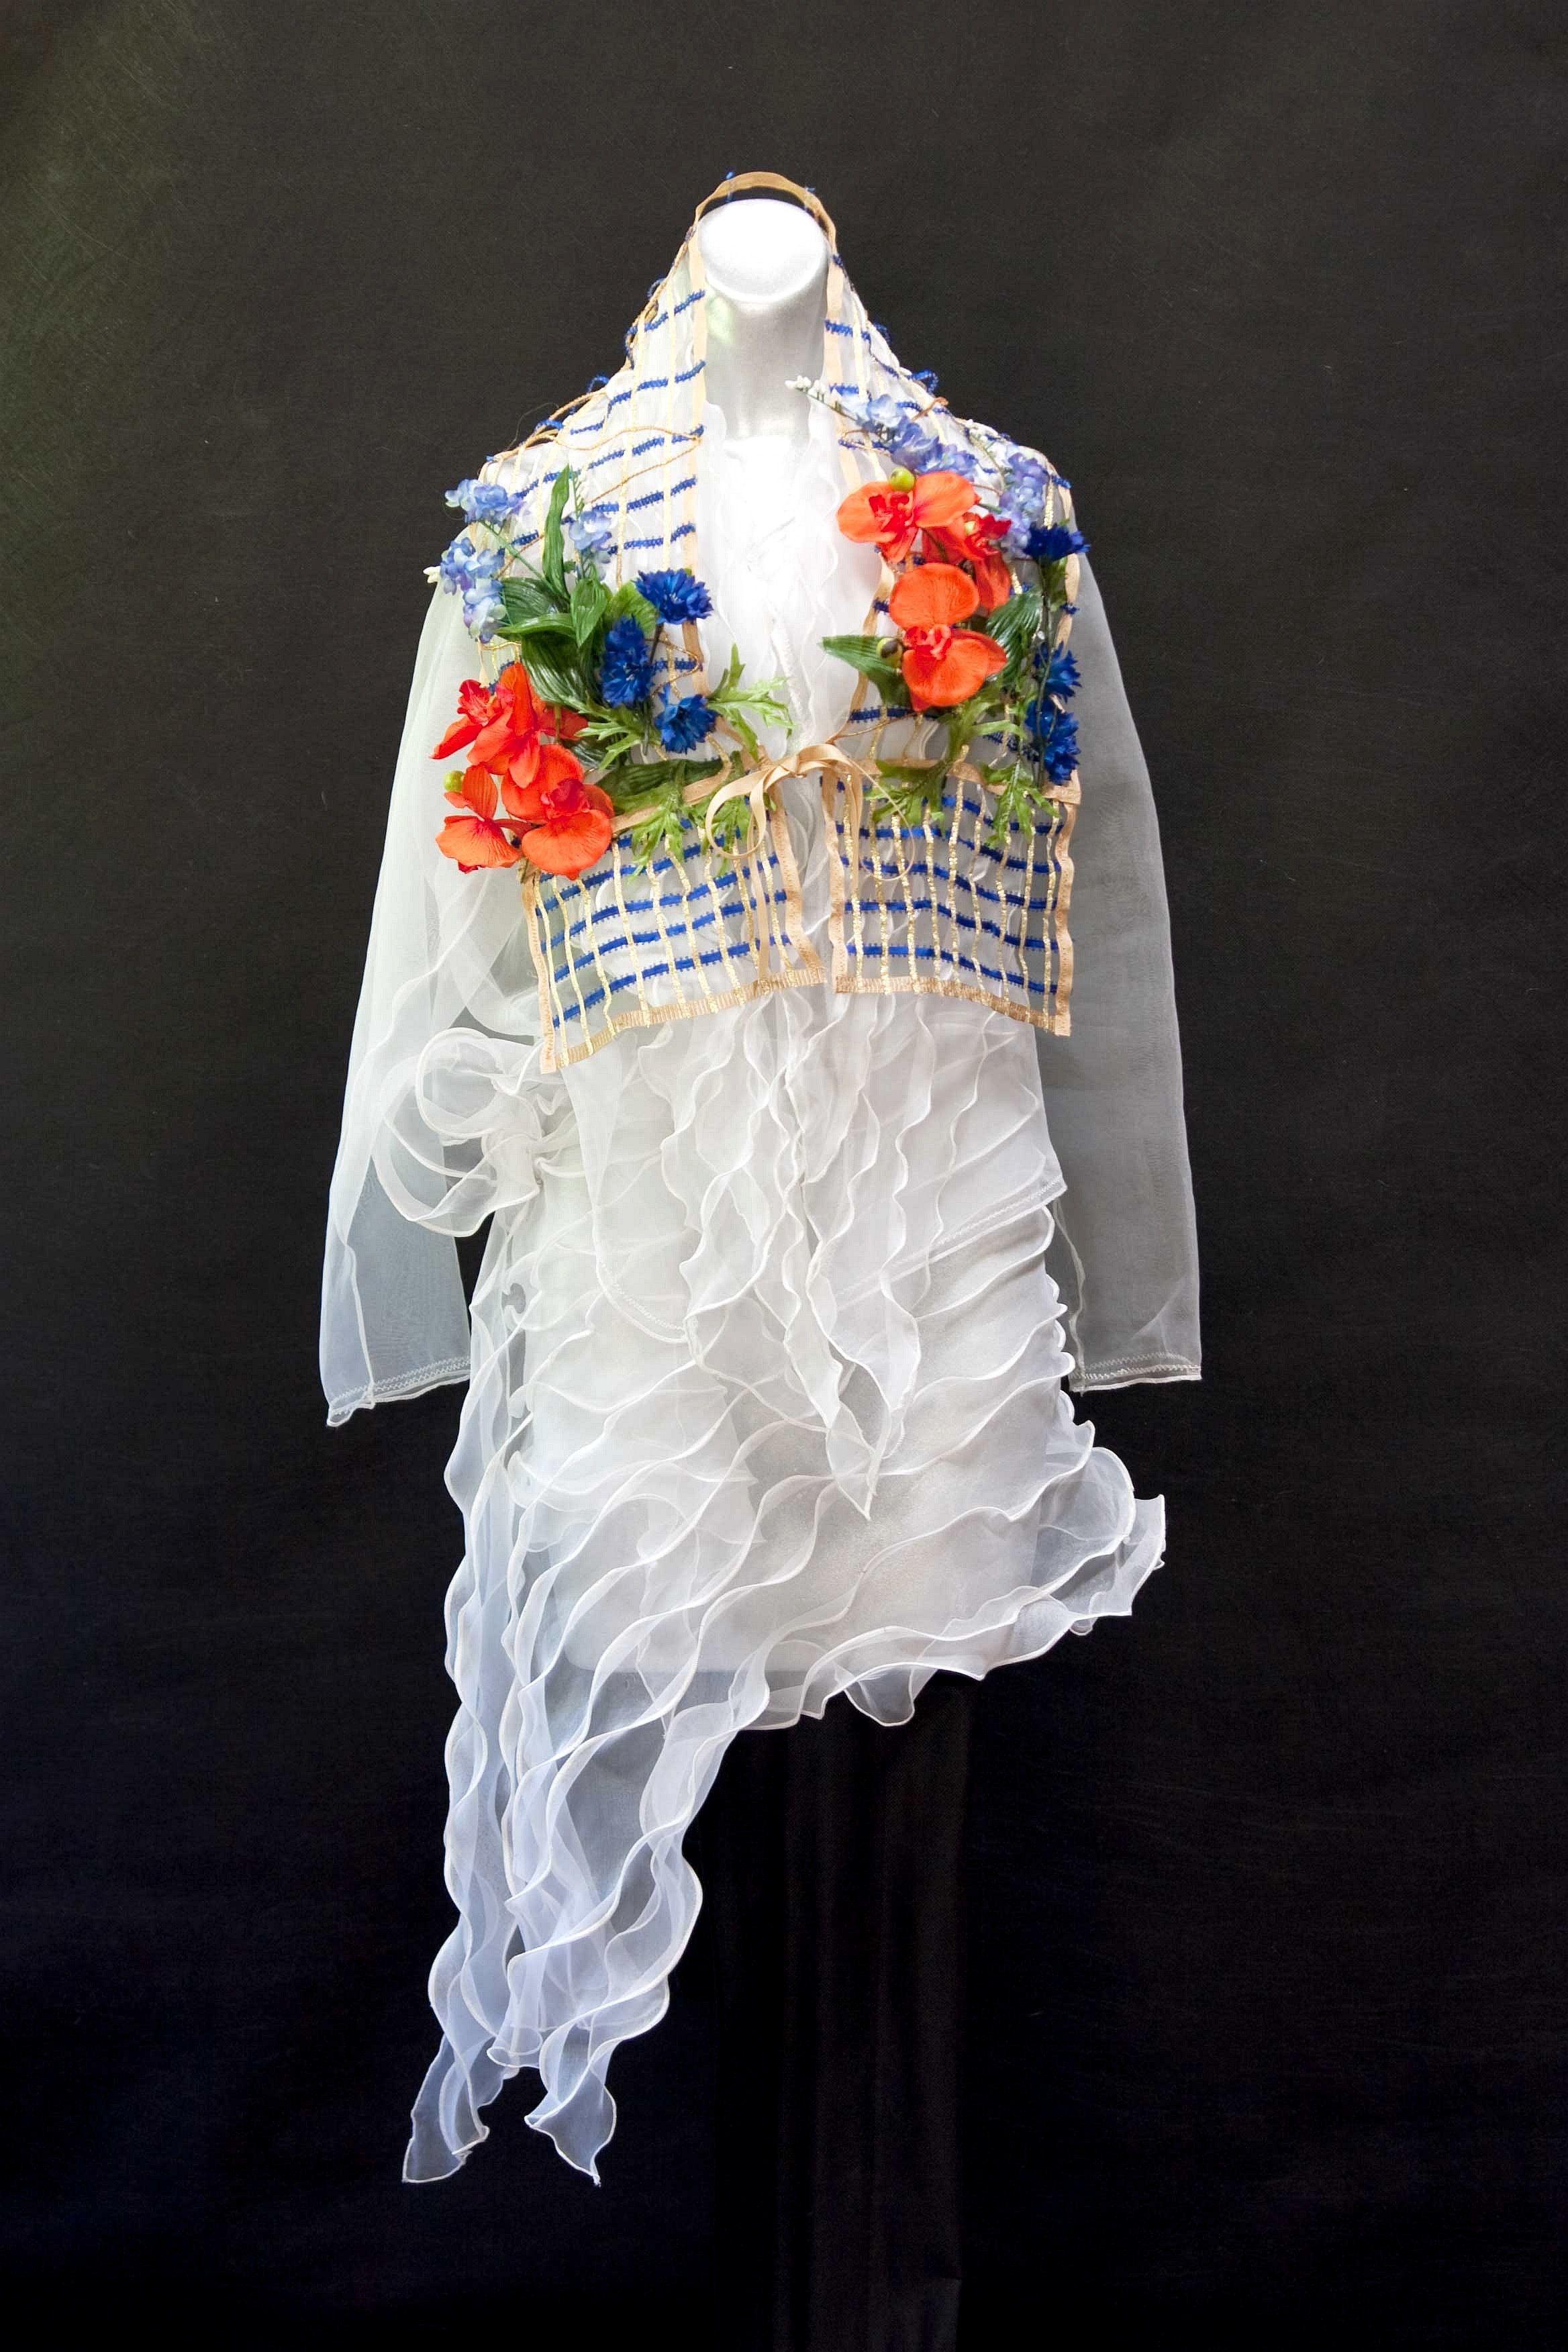 017 Fashion By Joan Ragno Upmarketdesigncomcast Ccm San